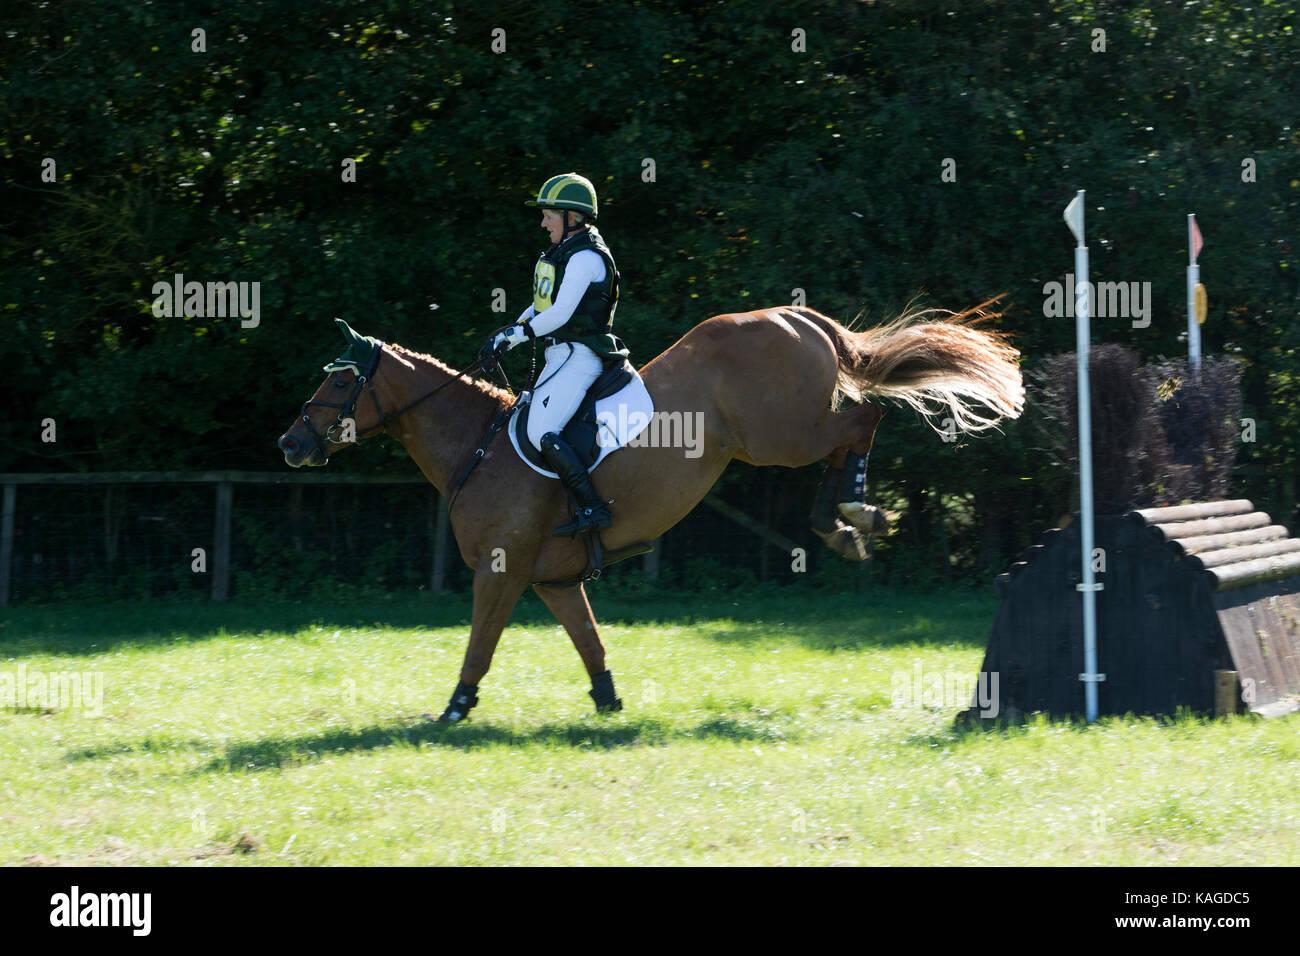 British Eventing Horse Trials, Moreton Morrell, Warwickshire, UK - Stock Image